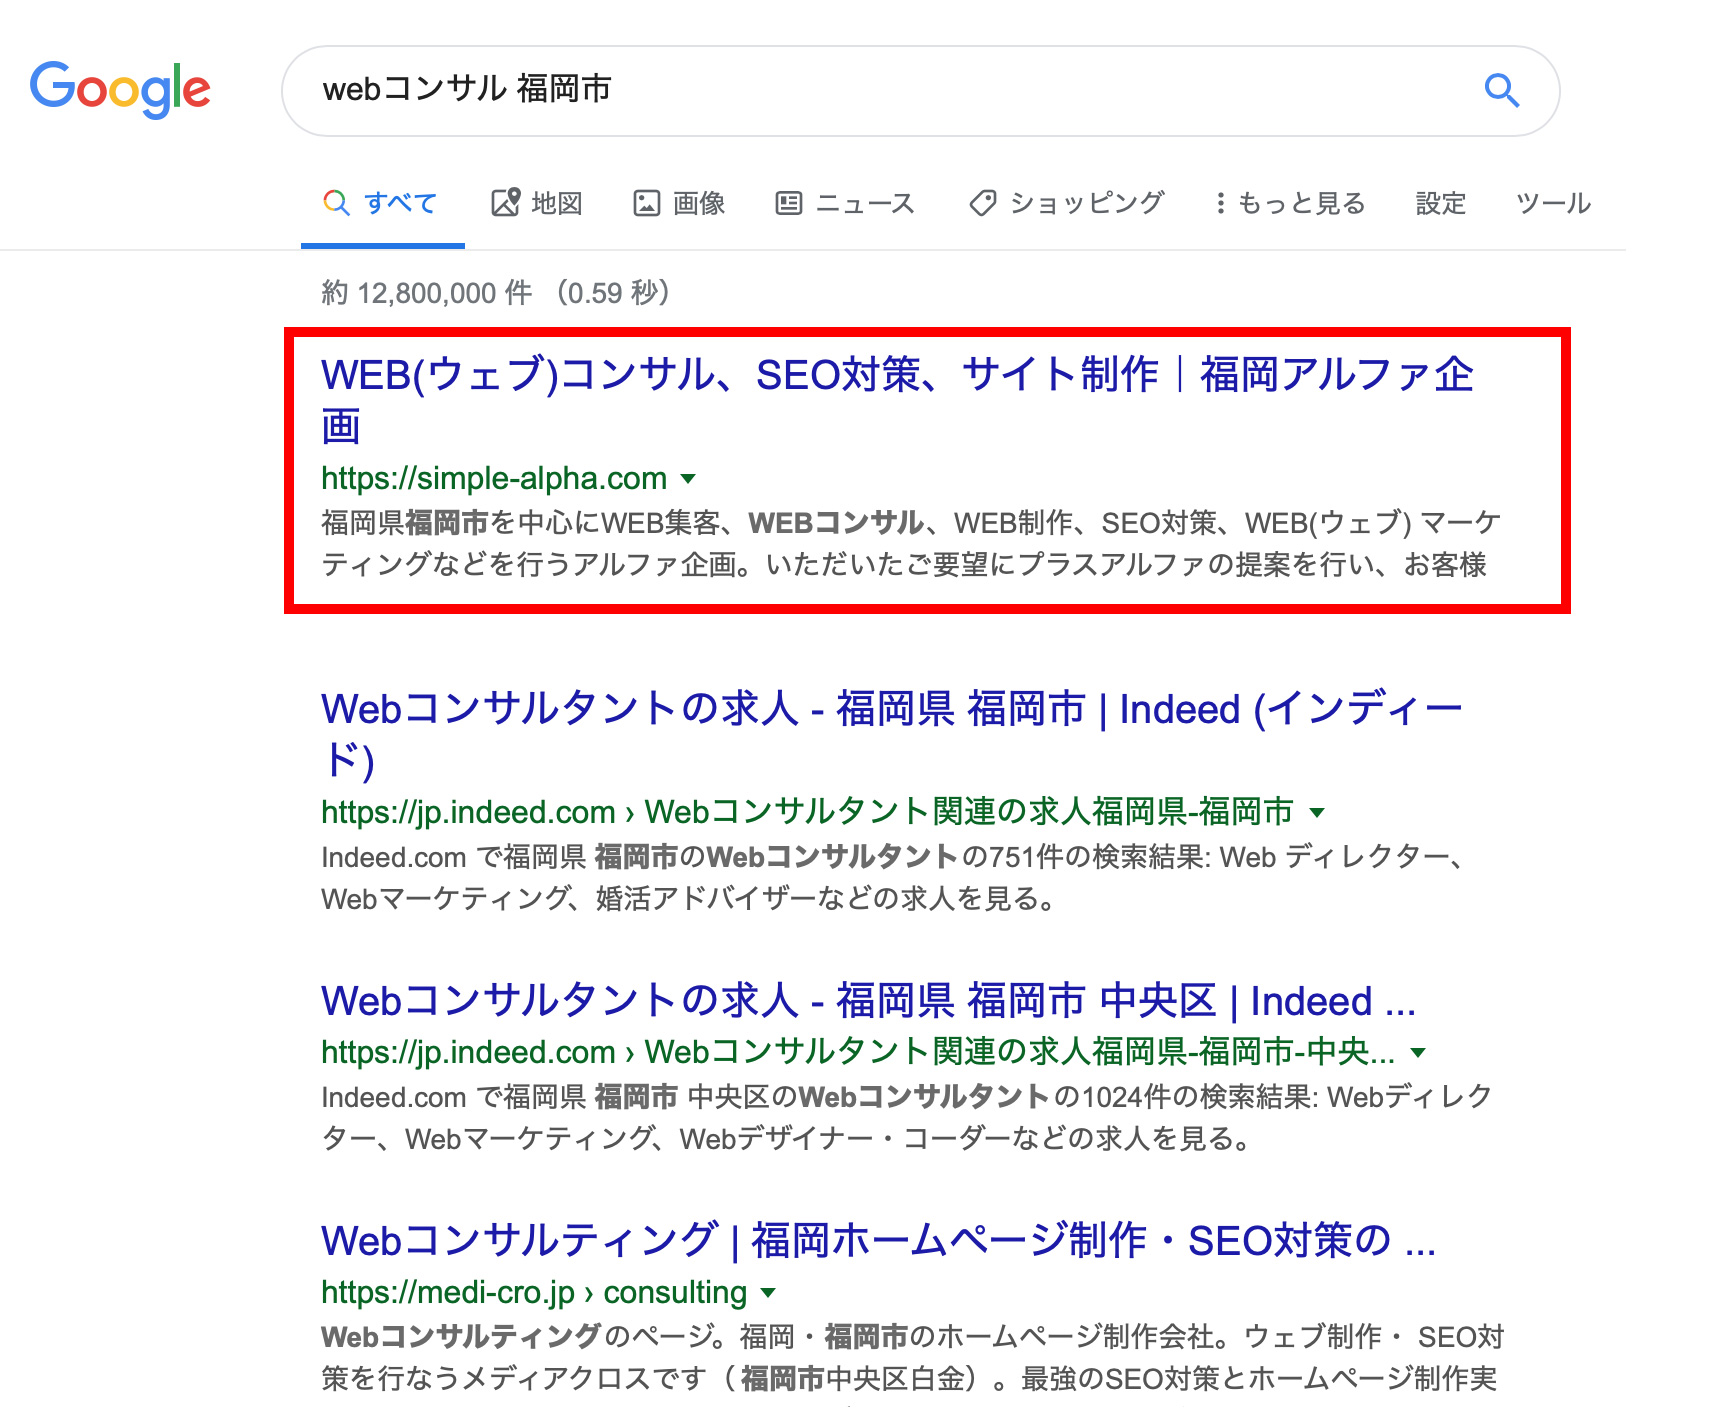 webコンサル 福岡